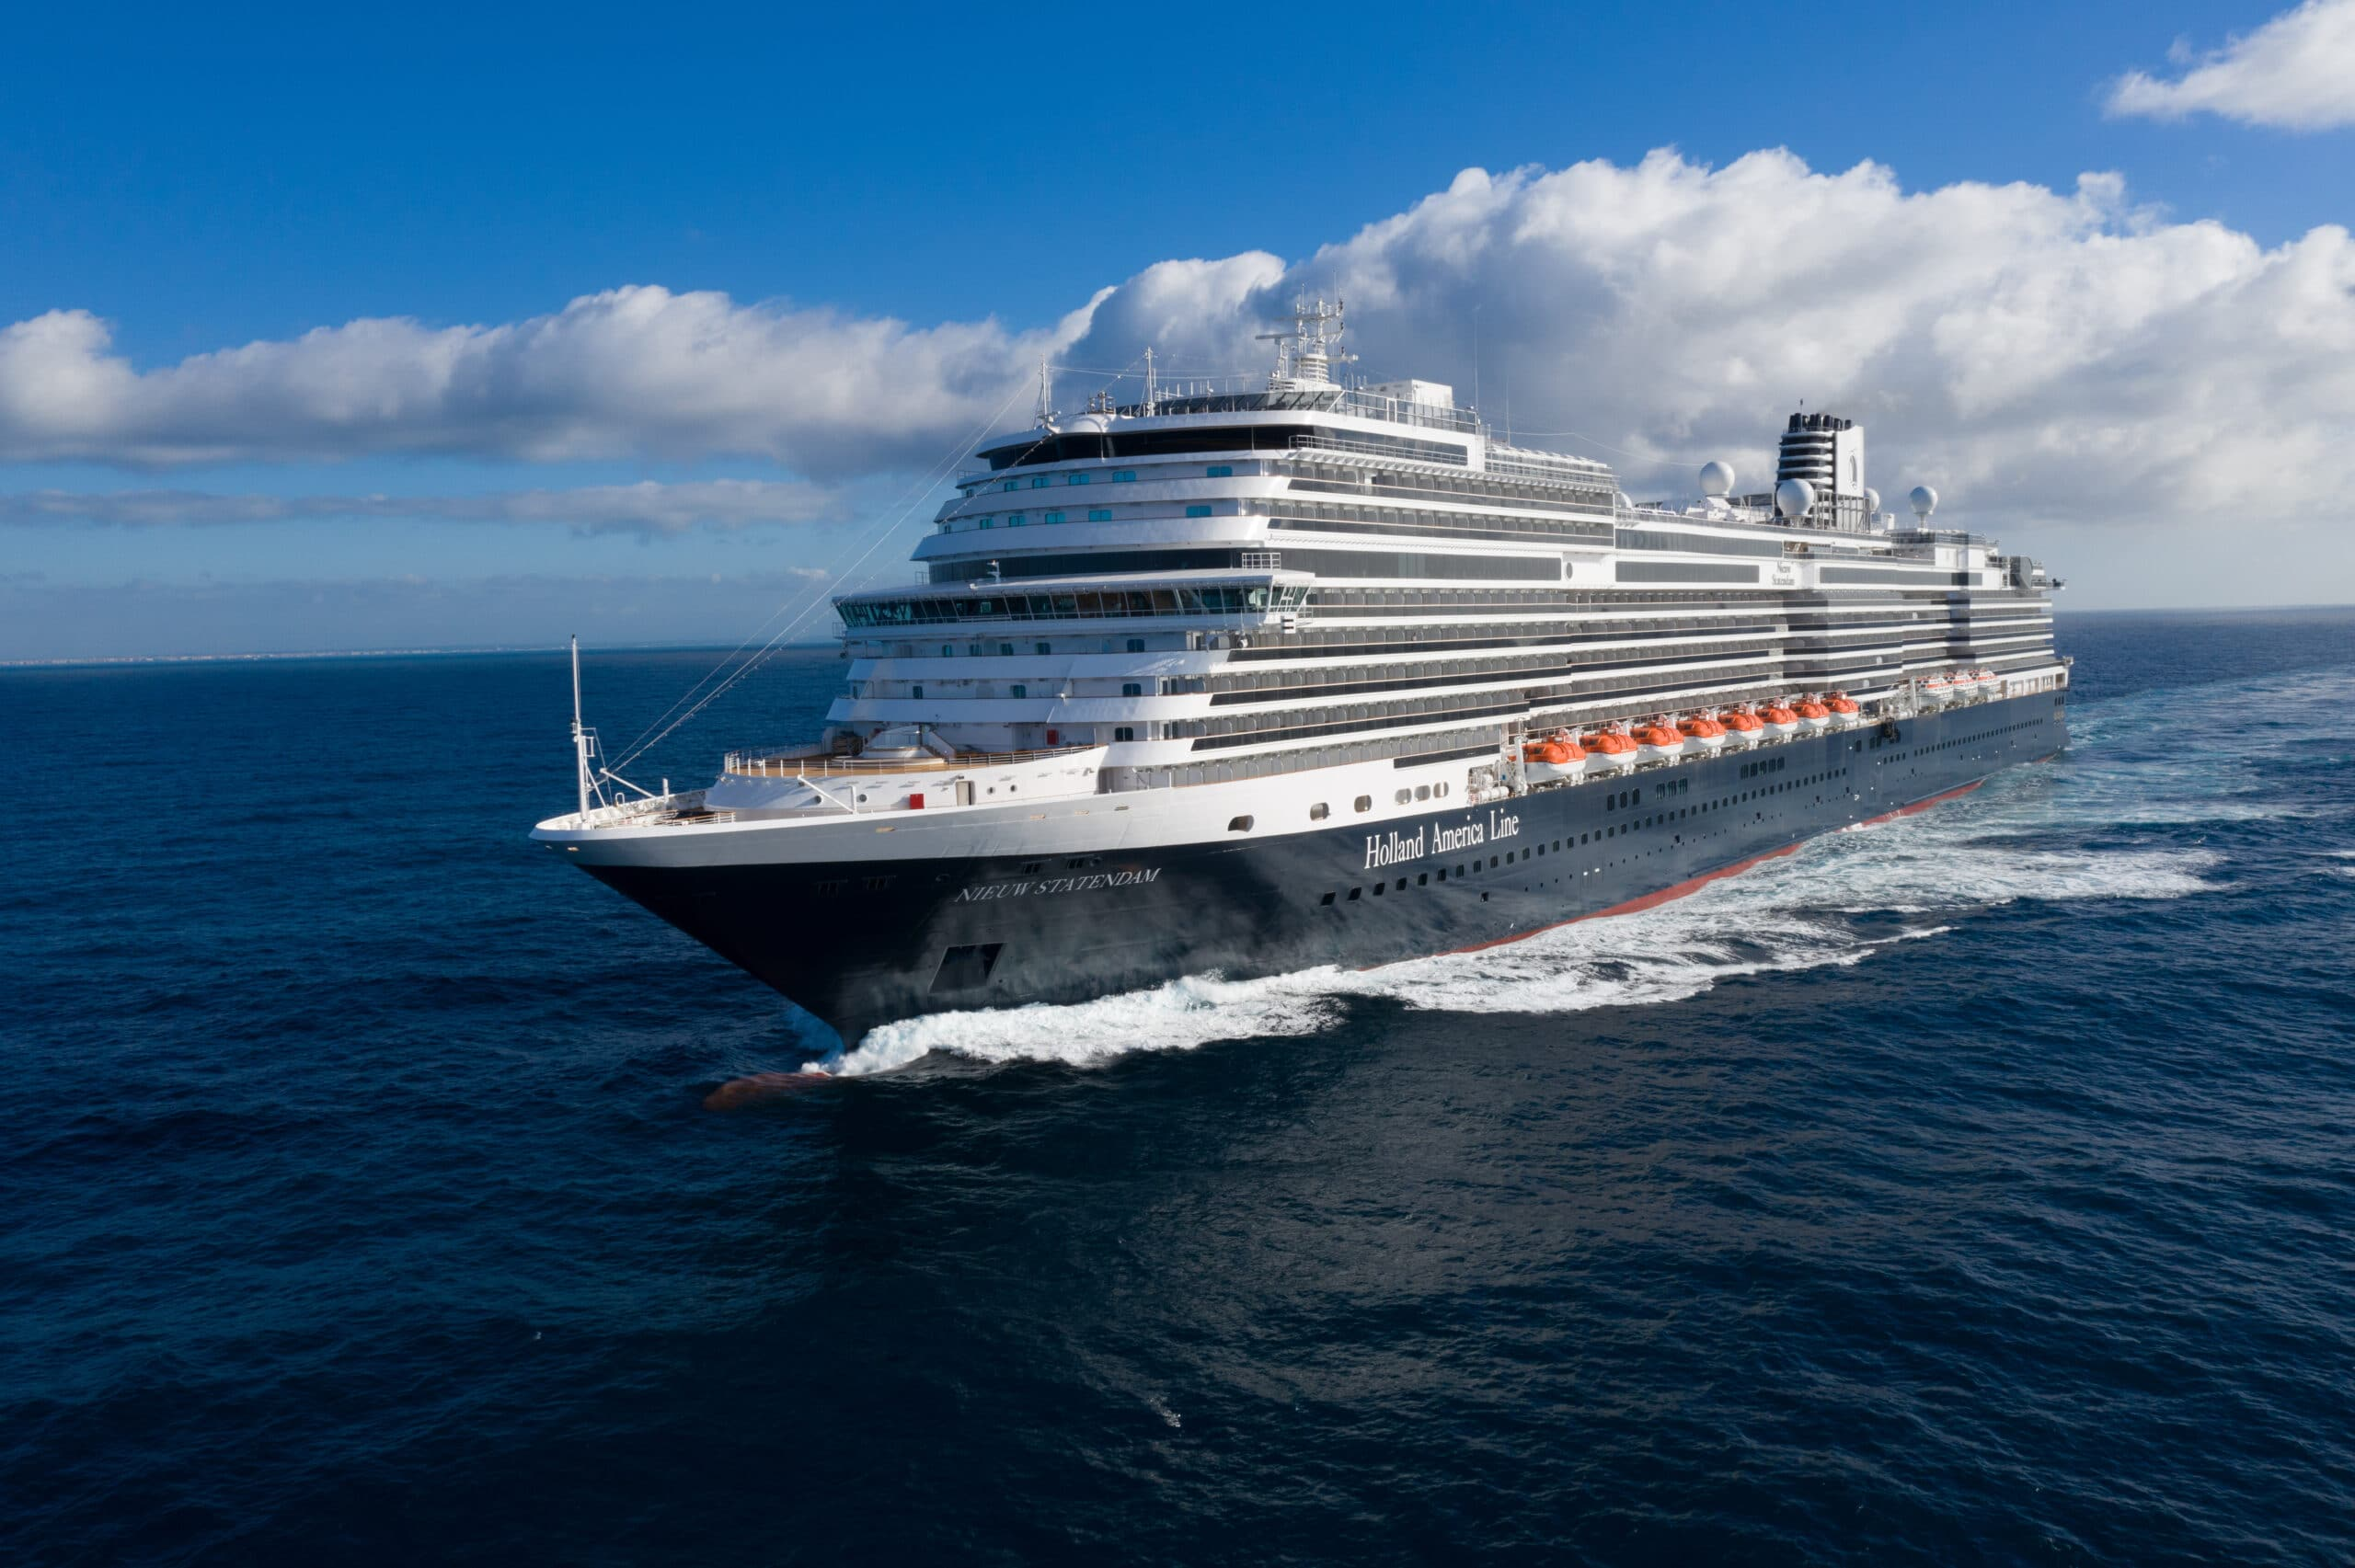 Nieuw Statendam-Holland America Line-Cruiseschip